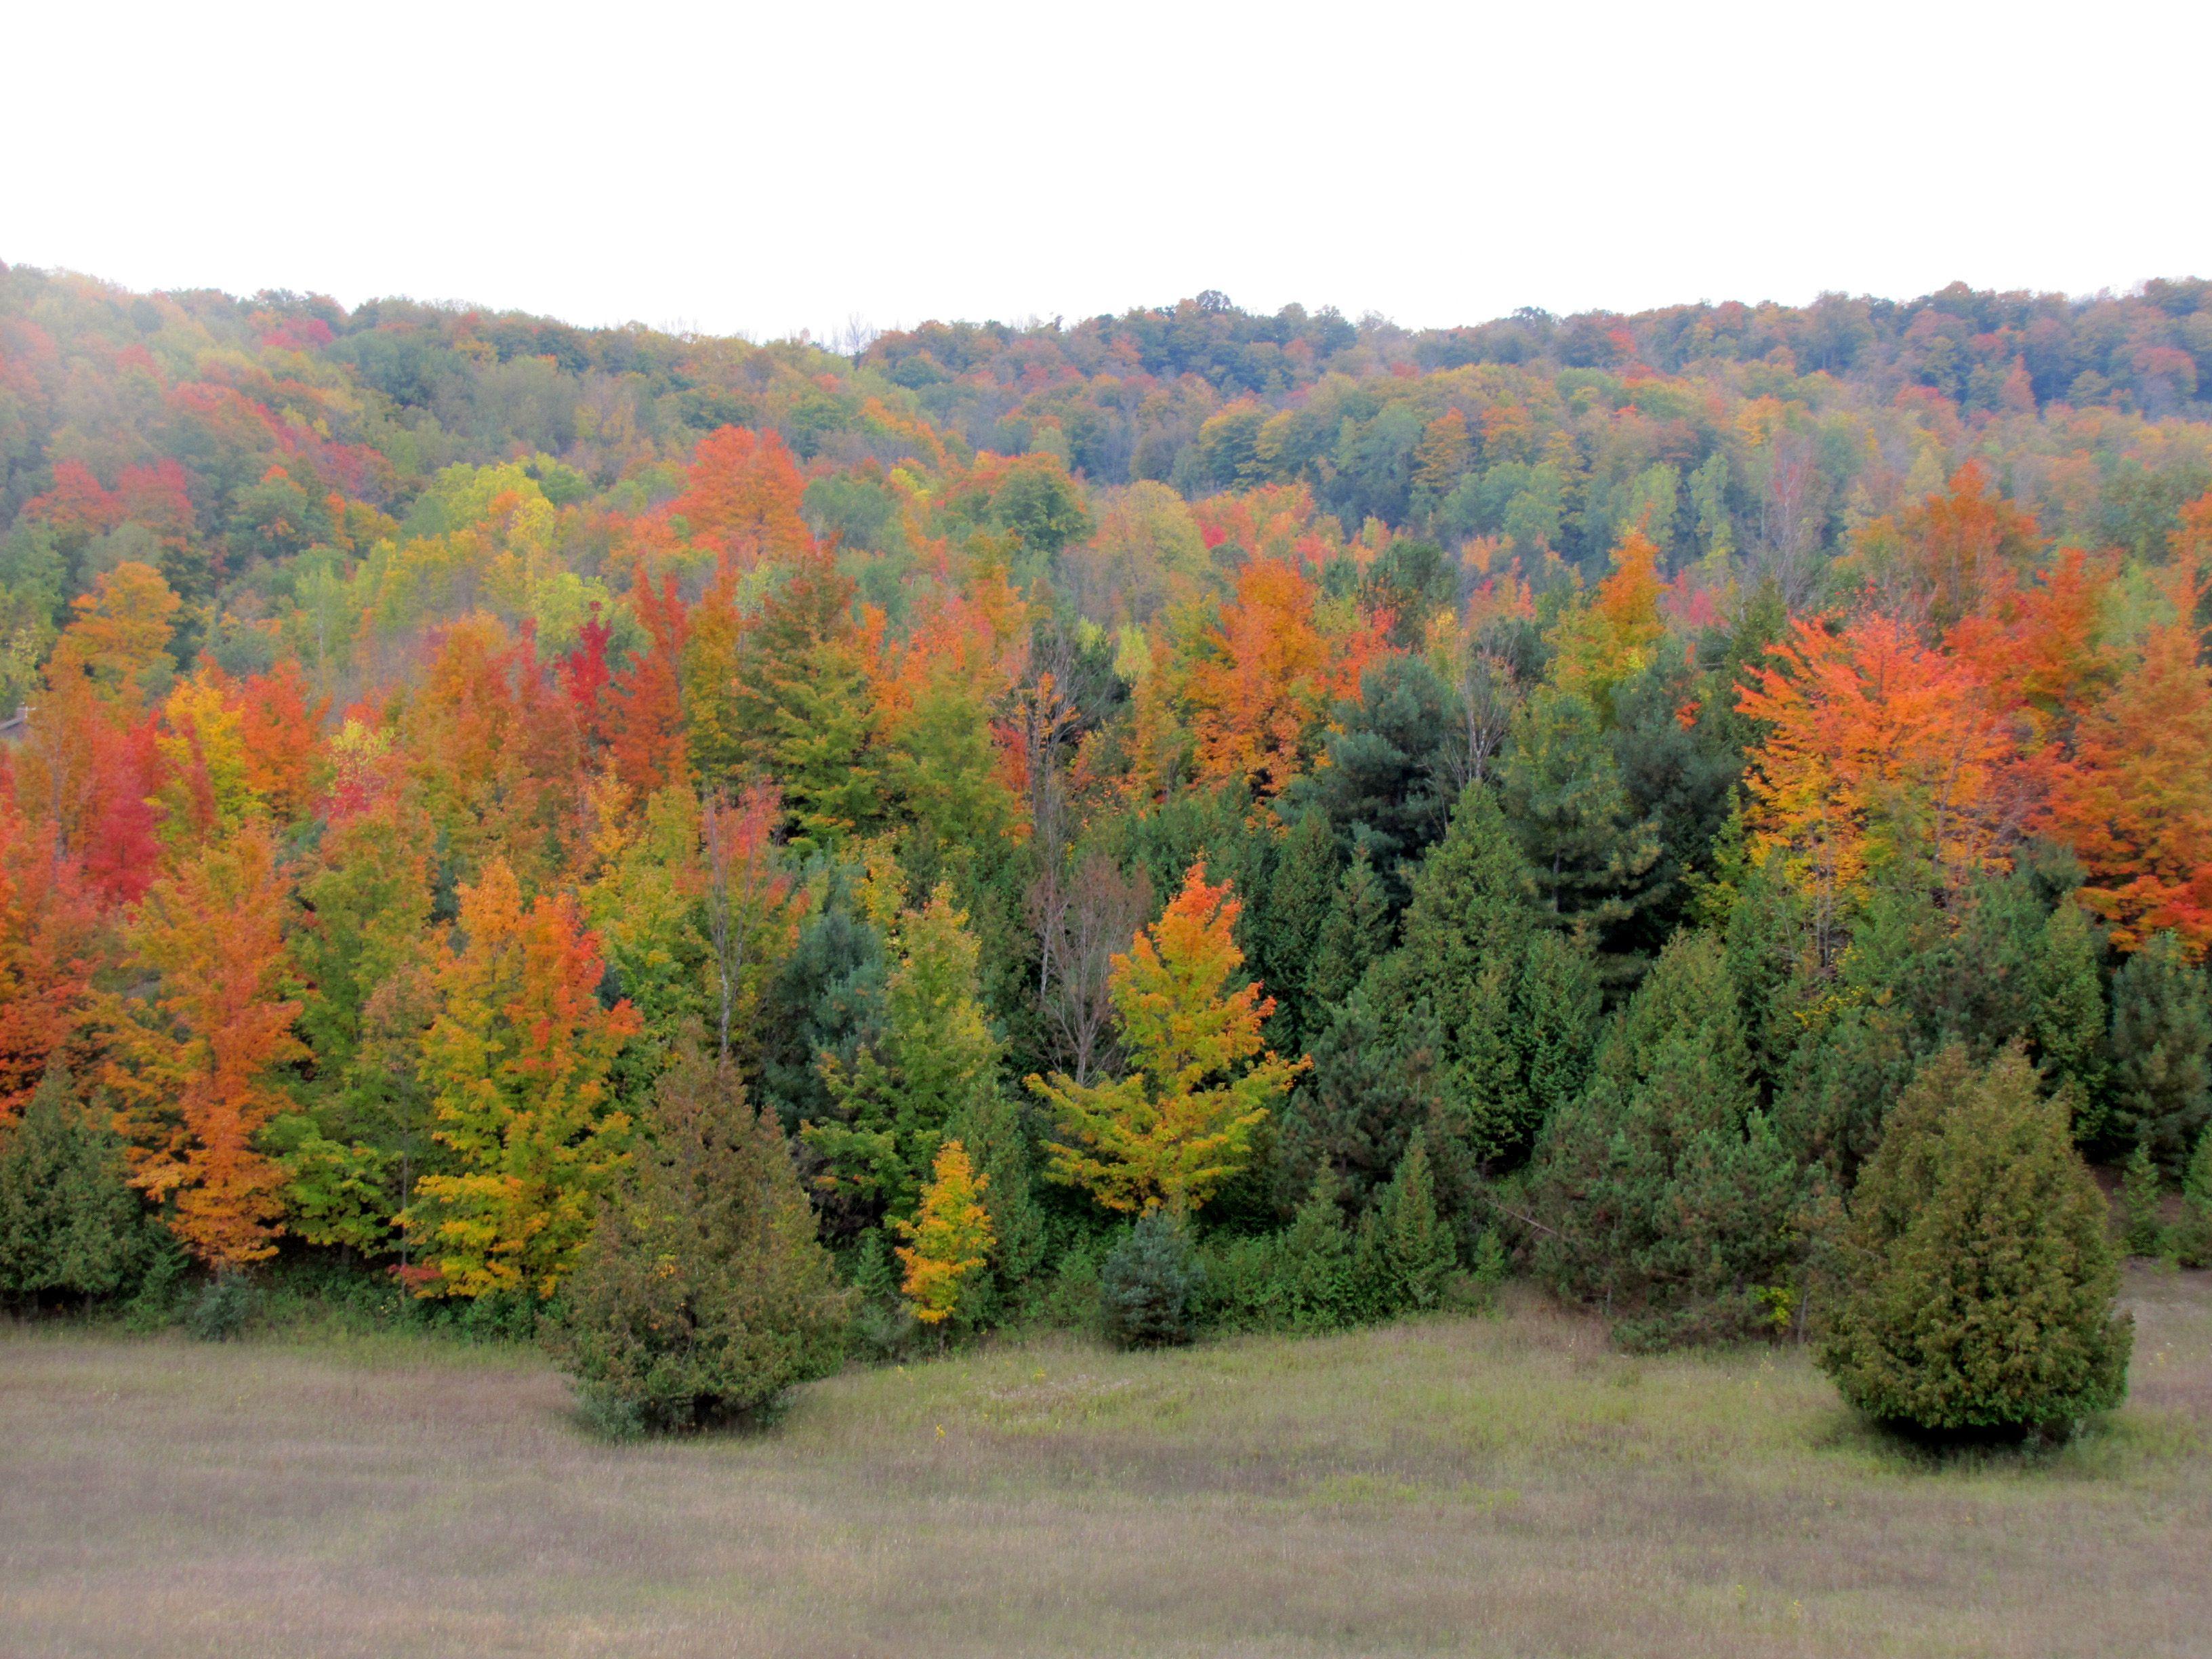 Fall Foliage In Traverse City Michigan Photography By Andrea Arbit Michigan Lowerpeninsula Upnorth North Michigan Photography Photography Fall Foliage